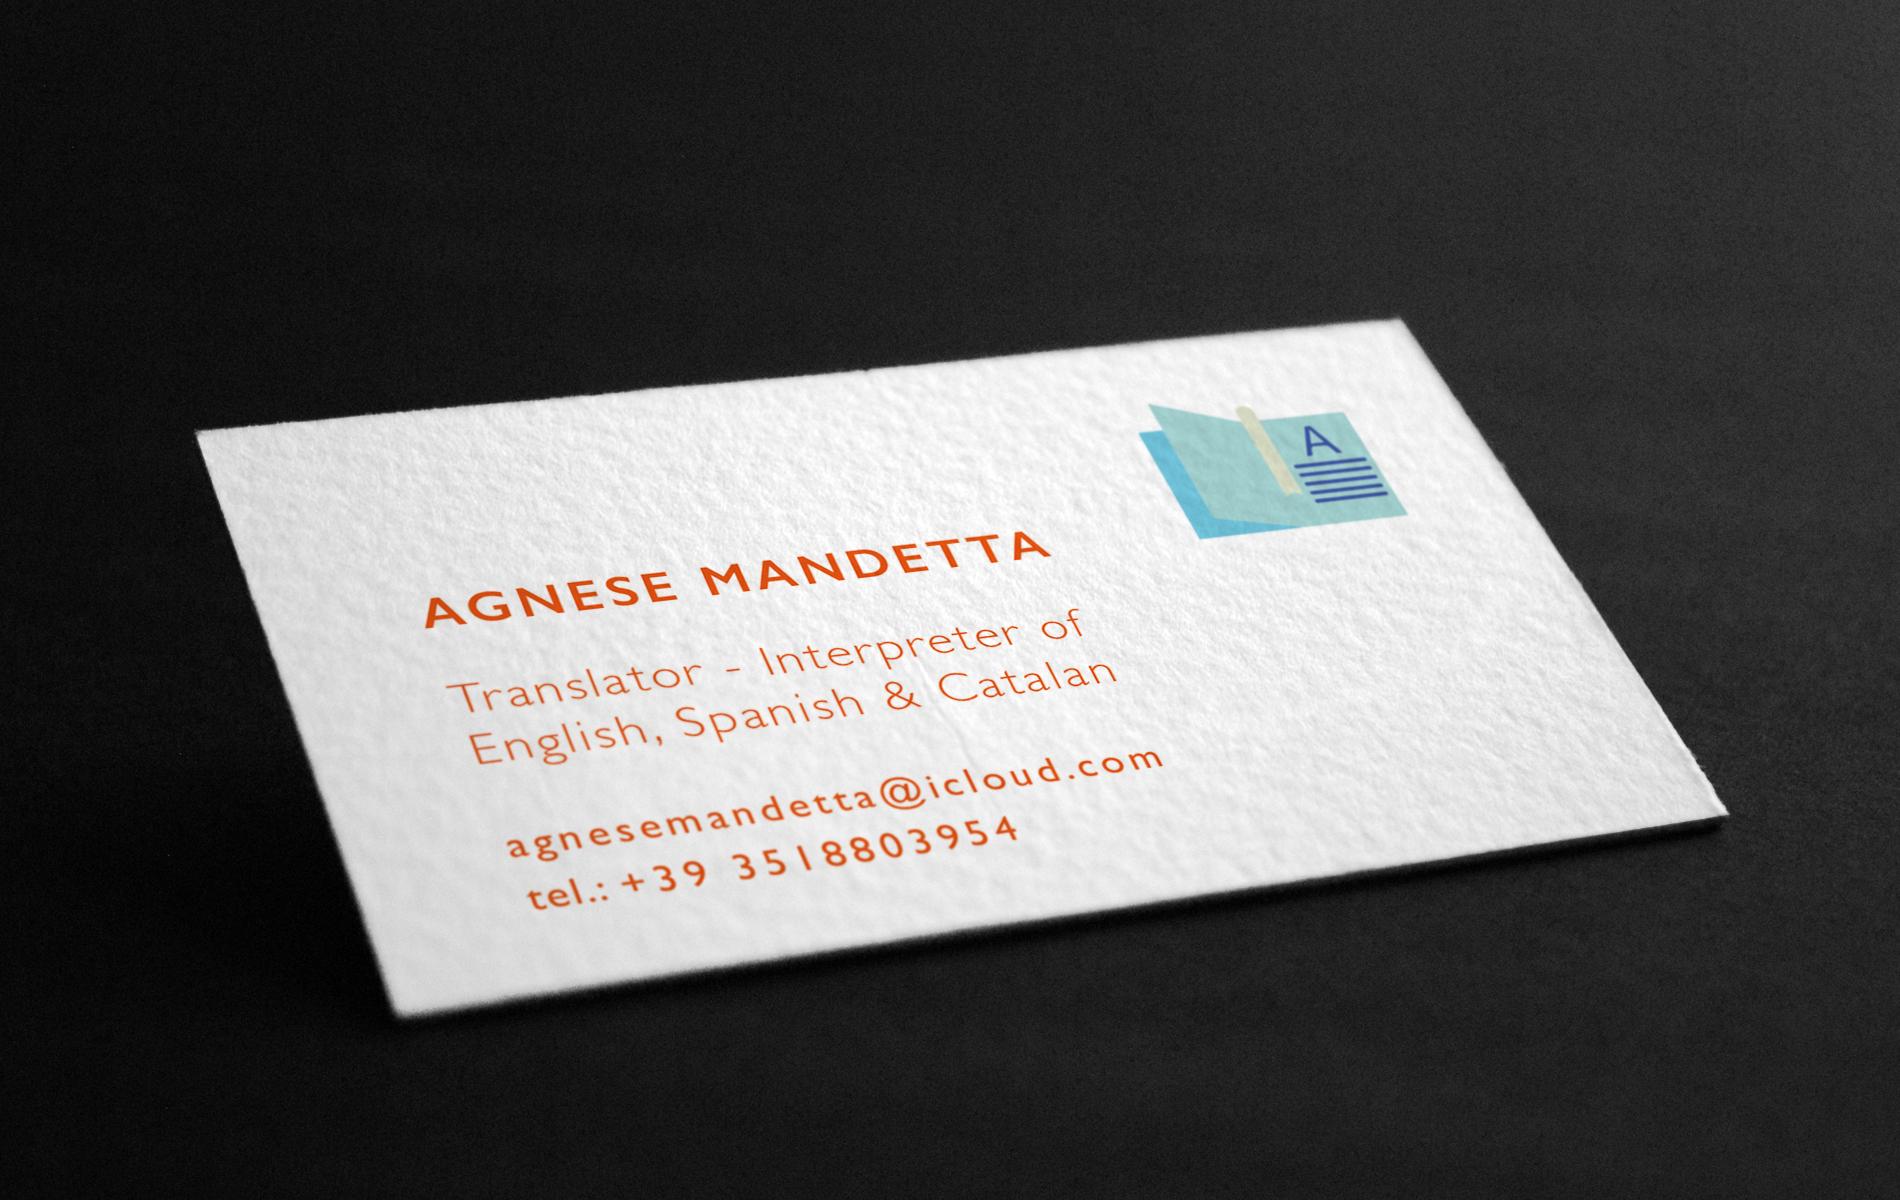 Agnese Mandetta